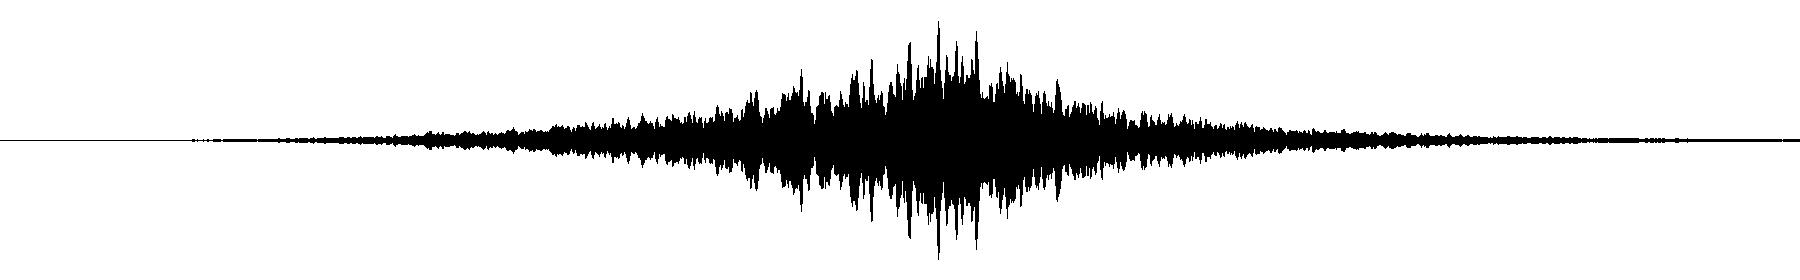 vocal riser